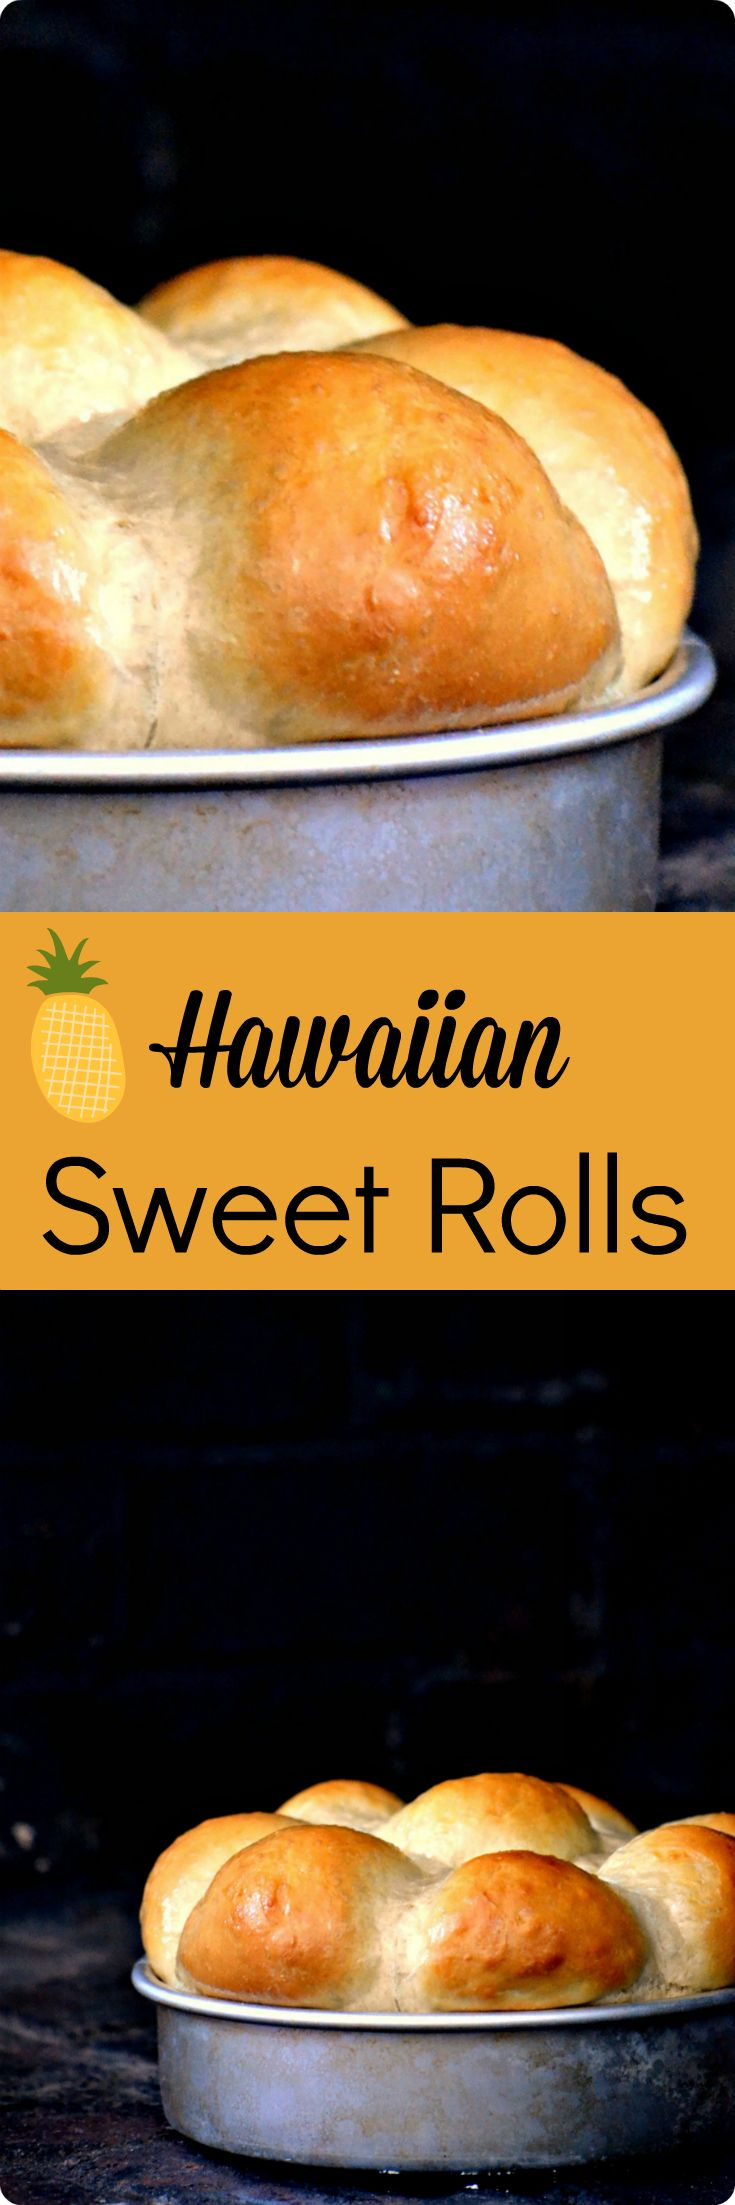 best hawaiian machine